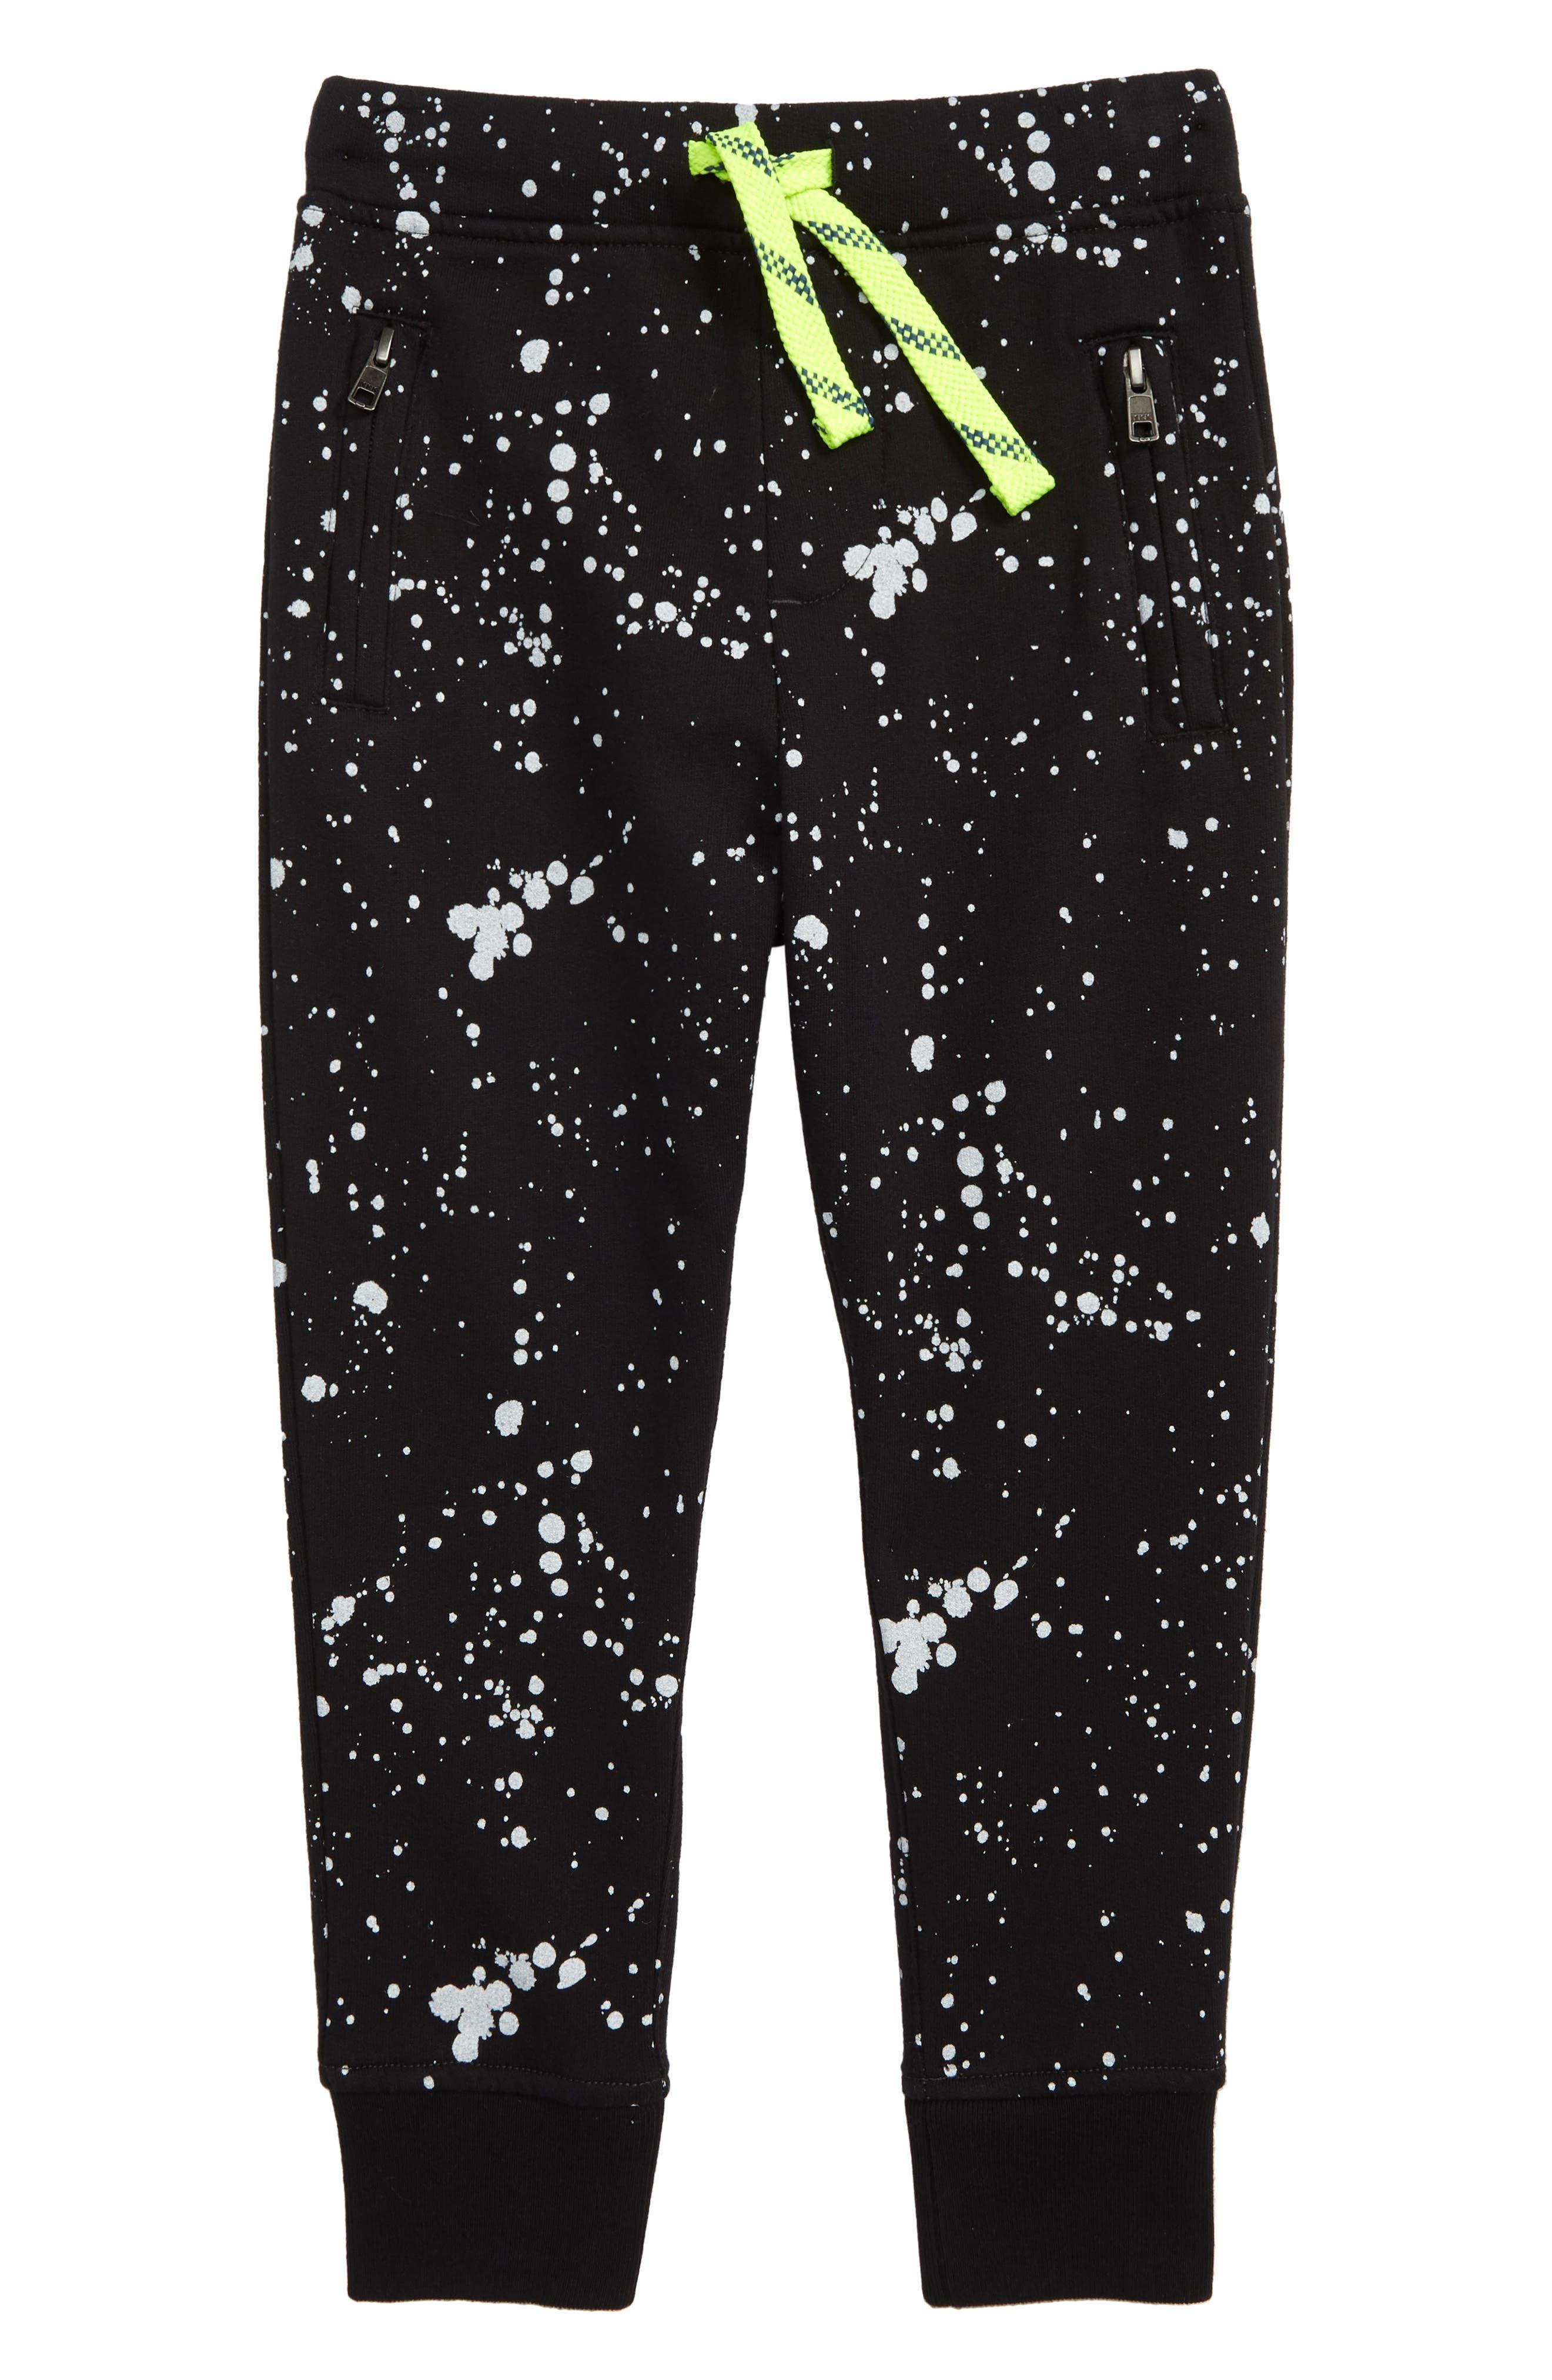 Boys Crewcuts By Jcrew Splatter Painted Sweatpants Size 14  Black